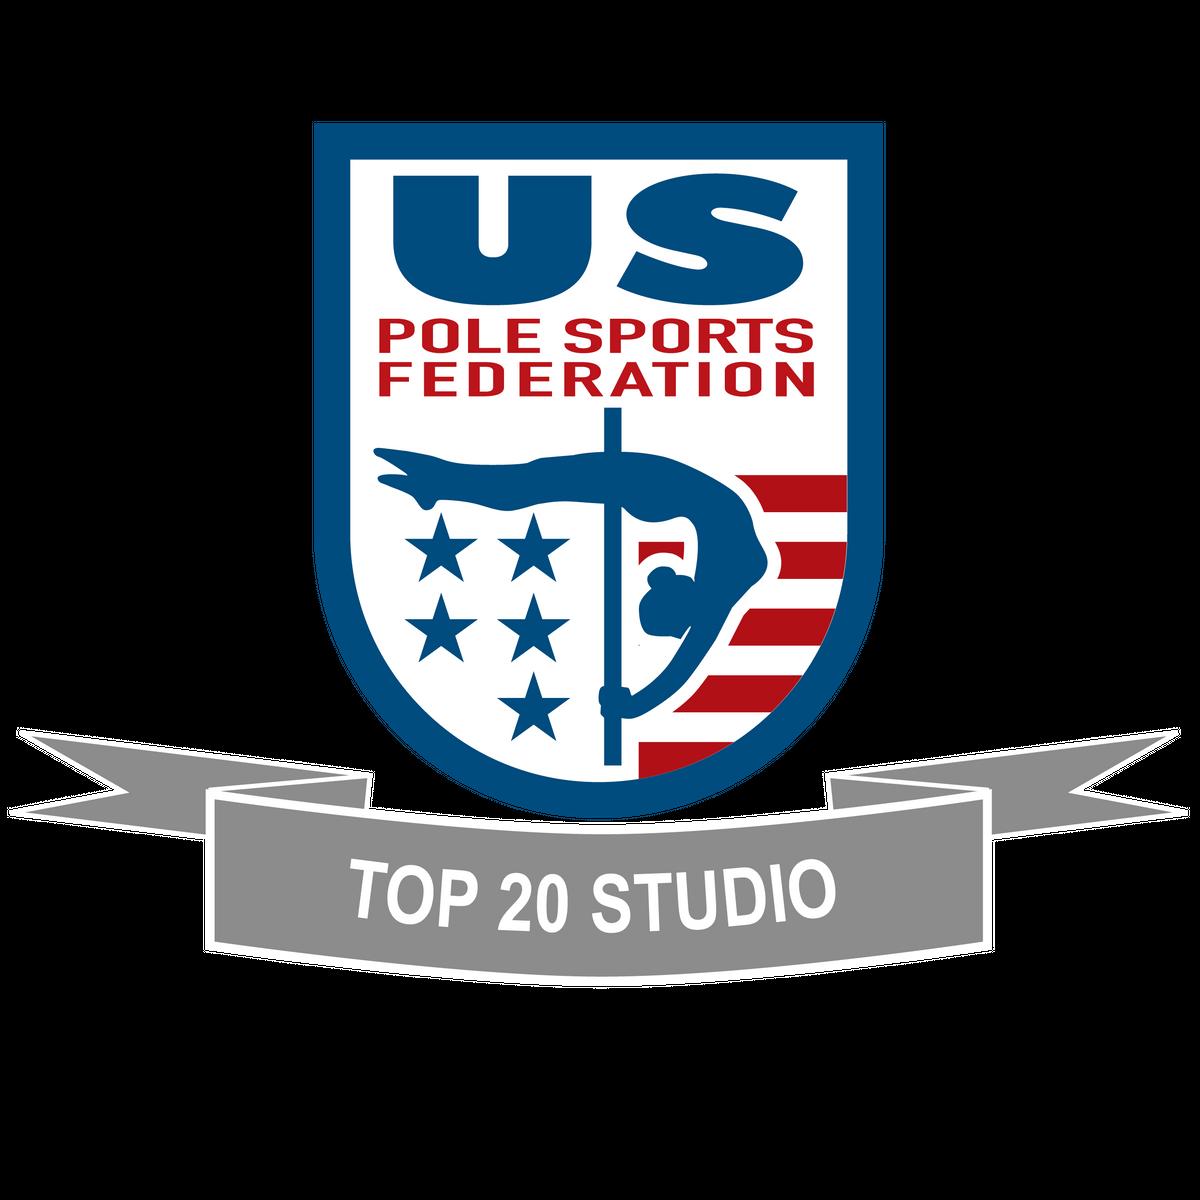 Top20StudioLOGO.png